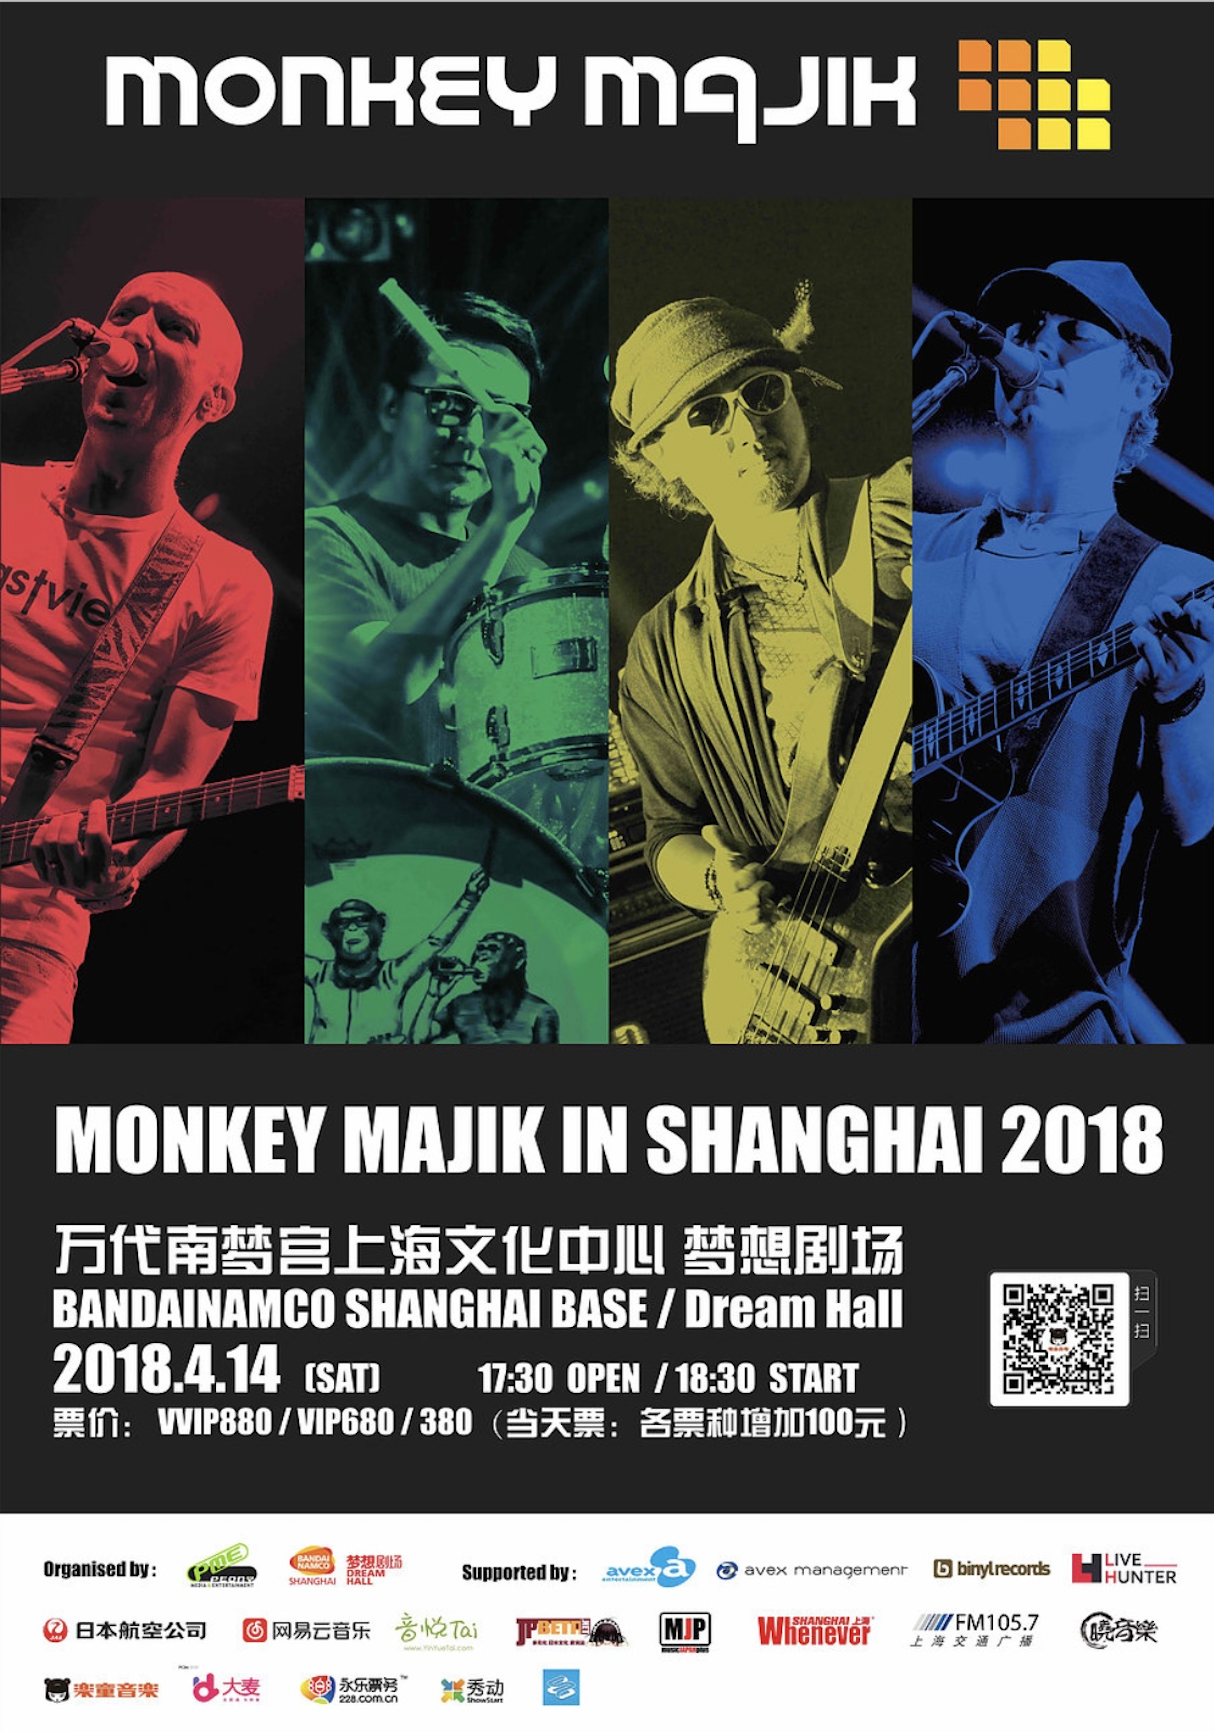 MONKEY MAJIK IN SHANGHAI 2018